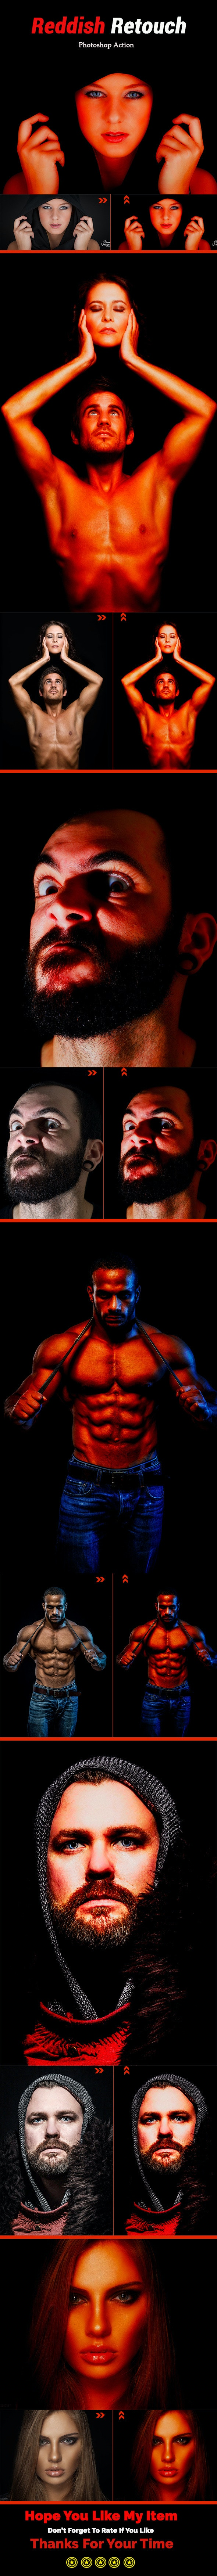 Reddish Retouch - Actions Photoshop